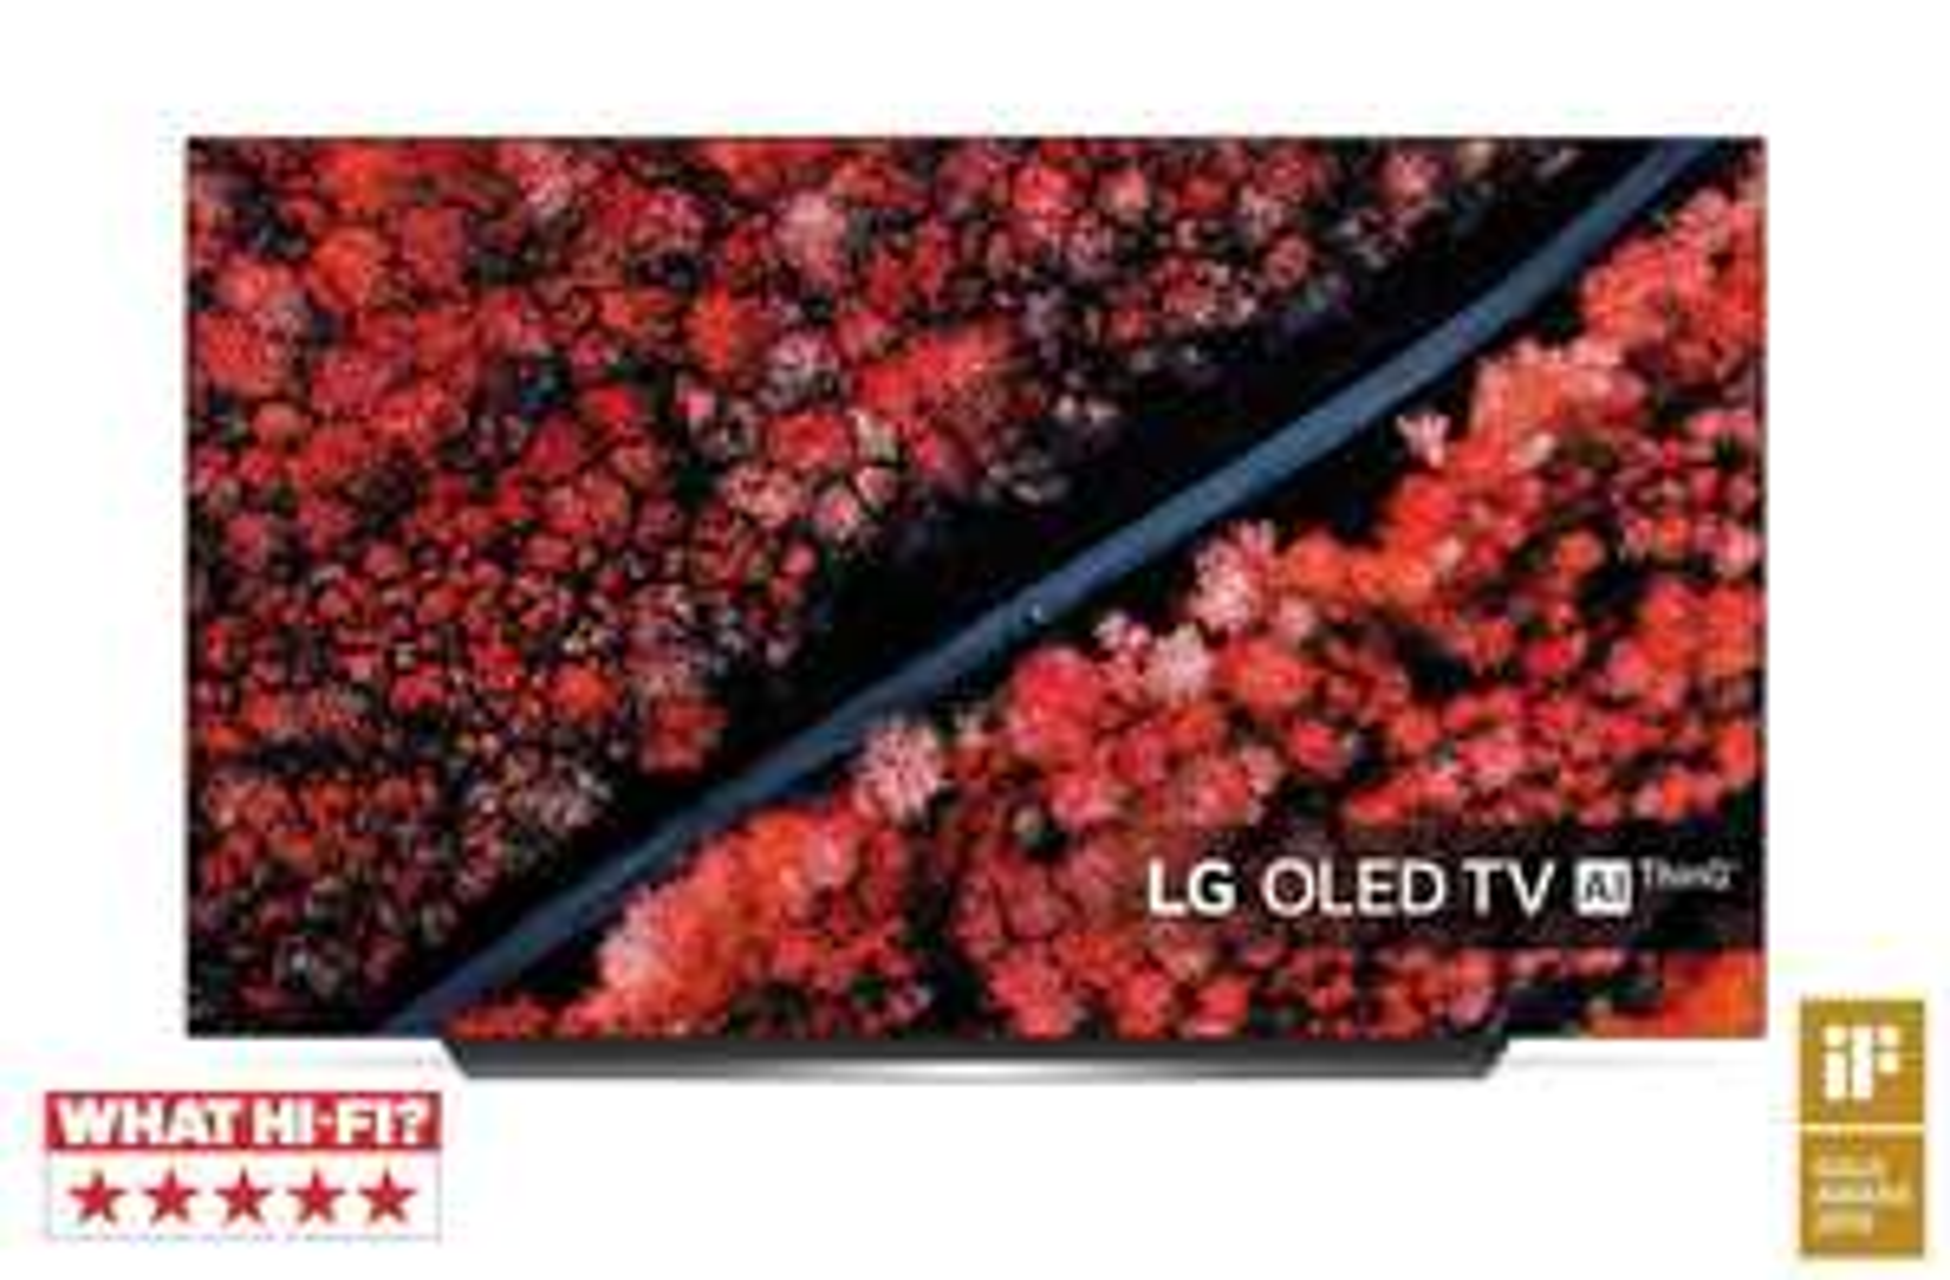 LG OLED55C9PLA £1,249 + £100 after sale voucher + optional £400 discount on Panasonic SC-HTB900 soundbar (reduced to £299) @ Richer Sounds